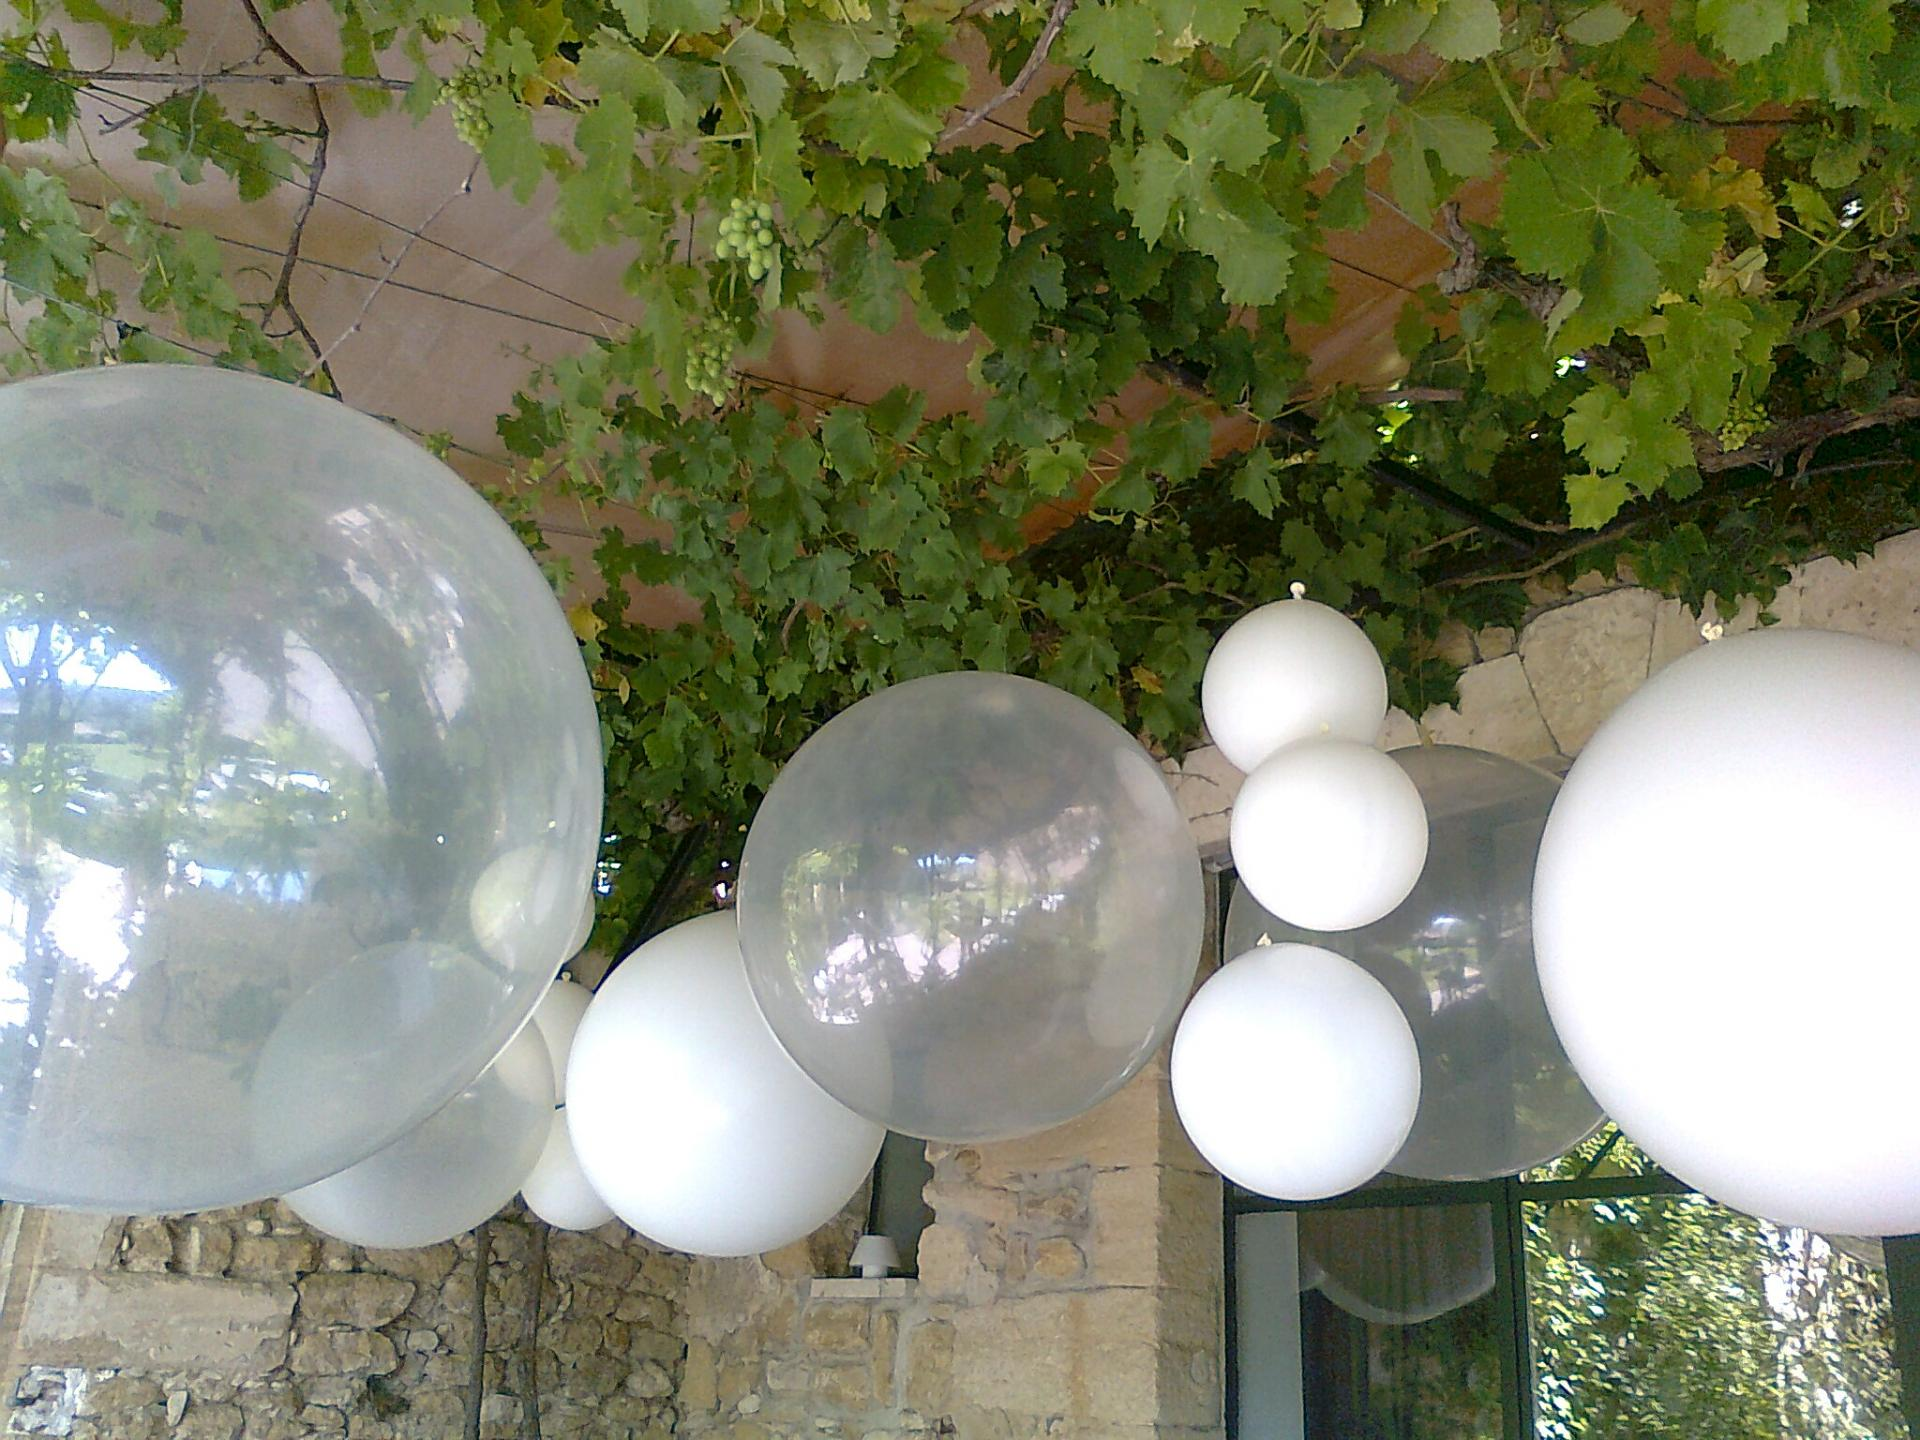 Décors gros ballons blancs